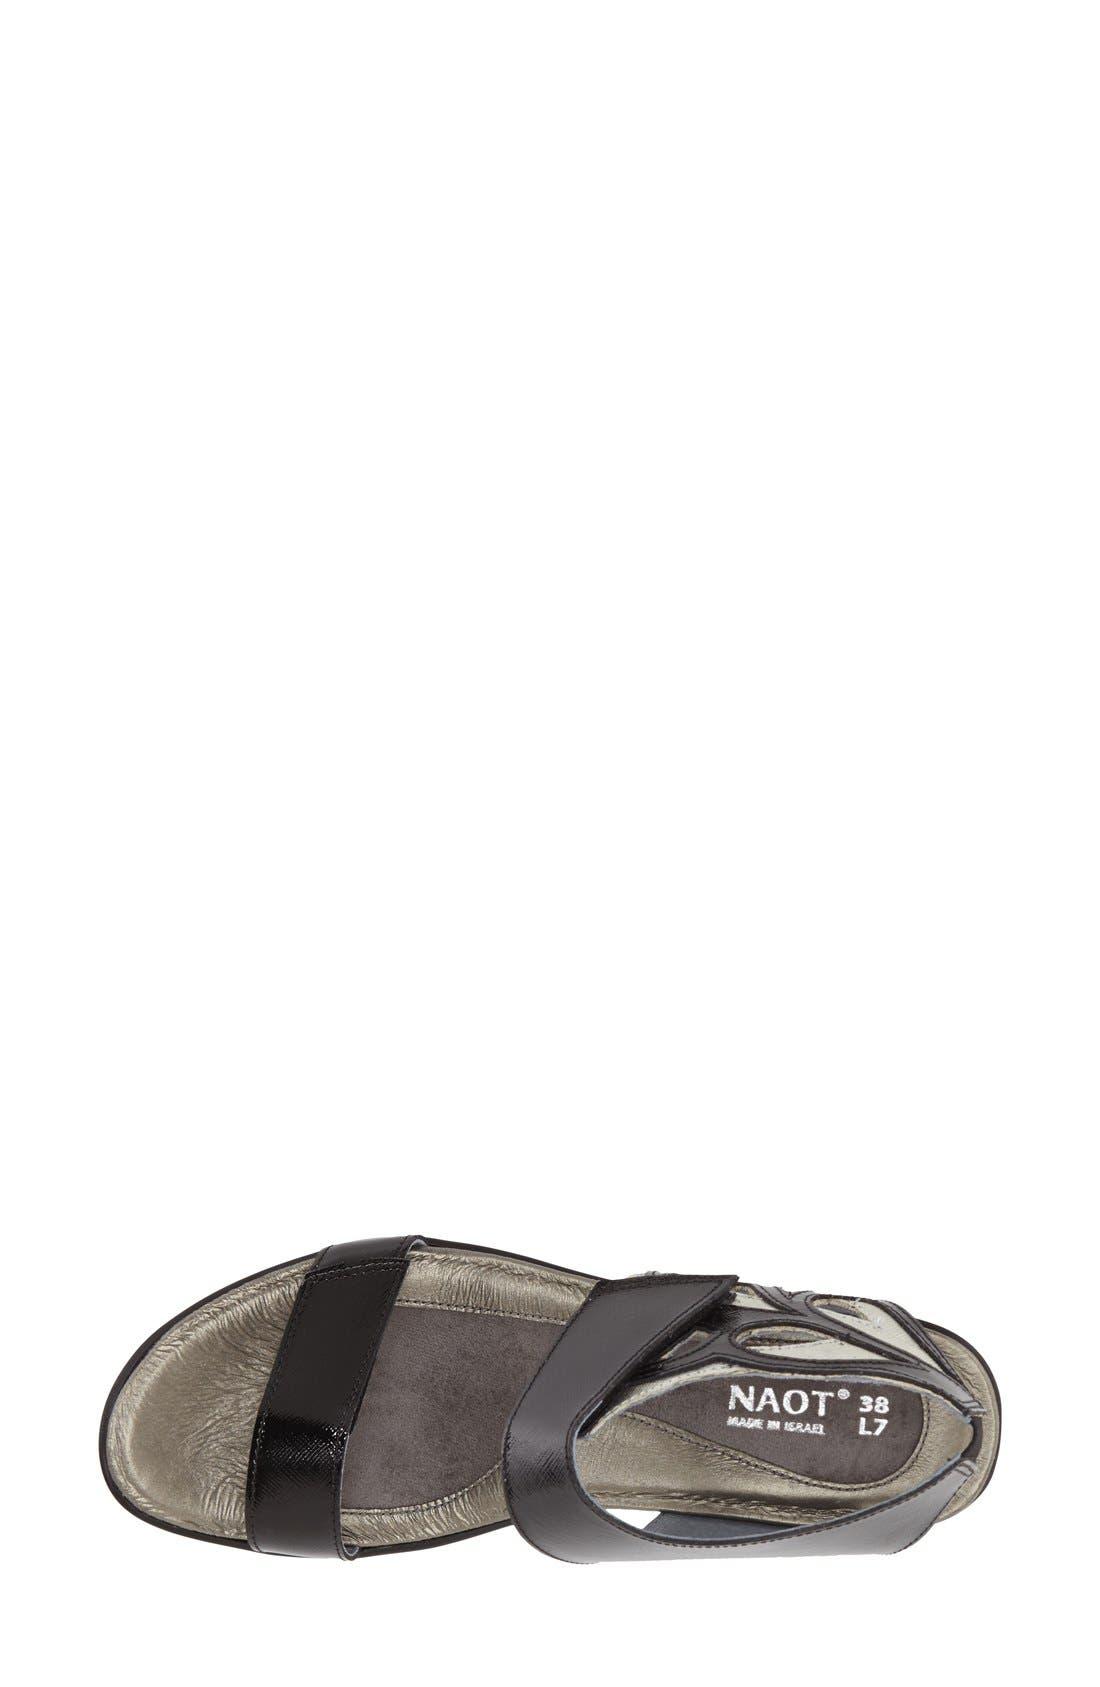 'Intrigue' Platform Wedge,                             Alternate thumbnail 3, color,                             Black Luster Leather